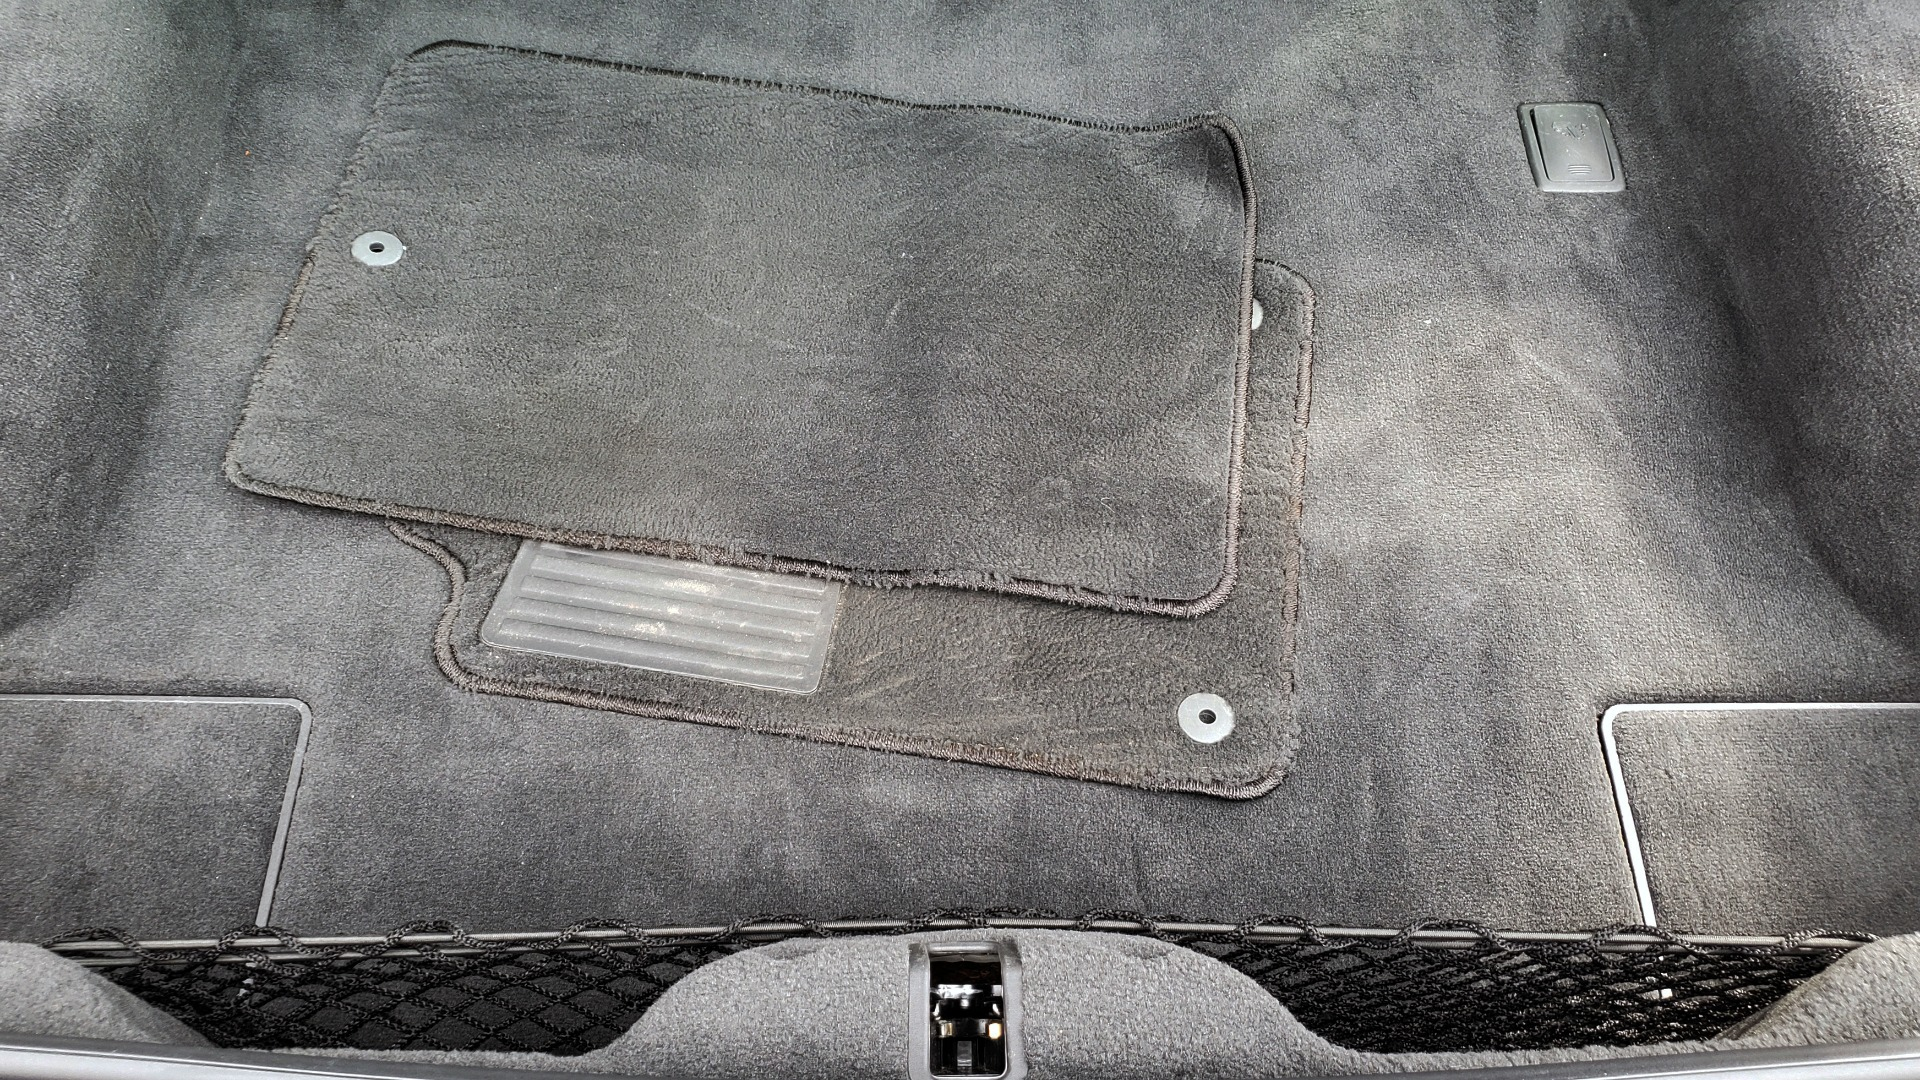 Used 2007 Chevrolet CORVETTE Z06 2LZ / 7.0L 427 V8 / 6-SPD MAN / BOSE / POLISHED WHEELS for sale Sold at Formula Imports in Charlotte NC 28227 35